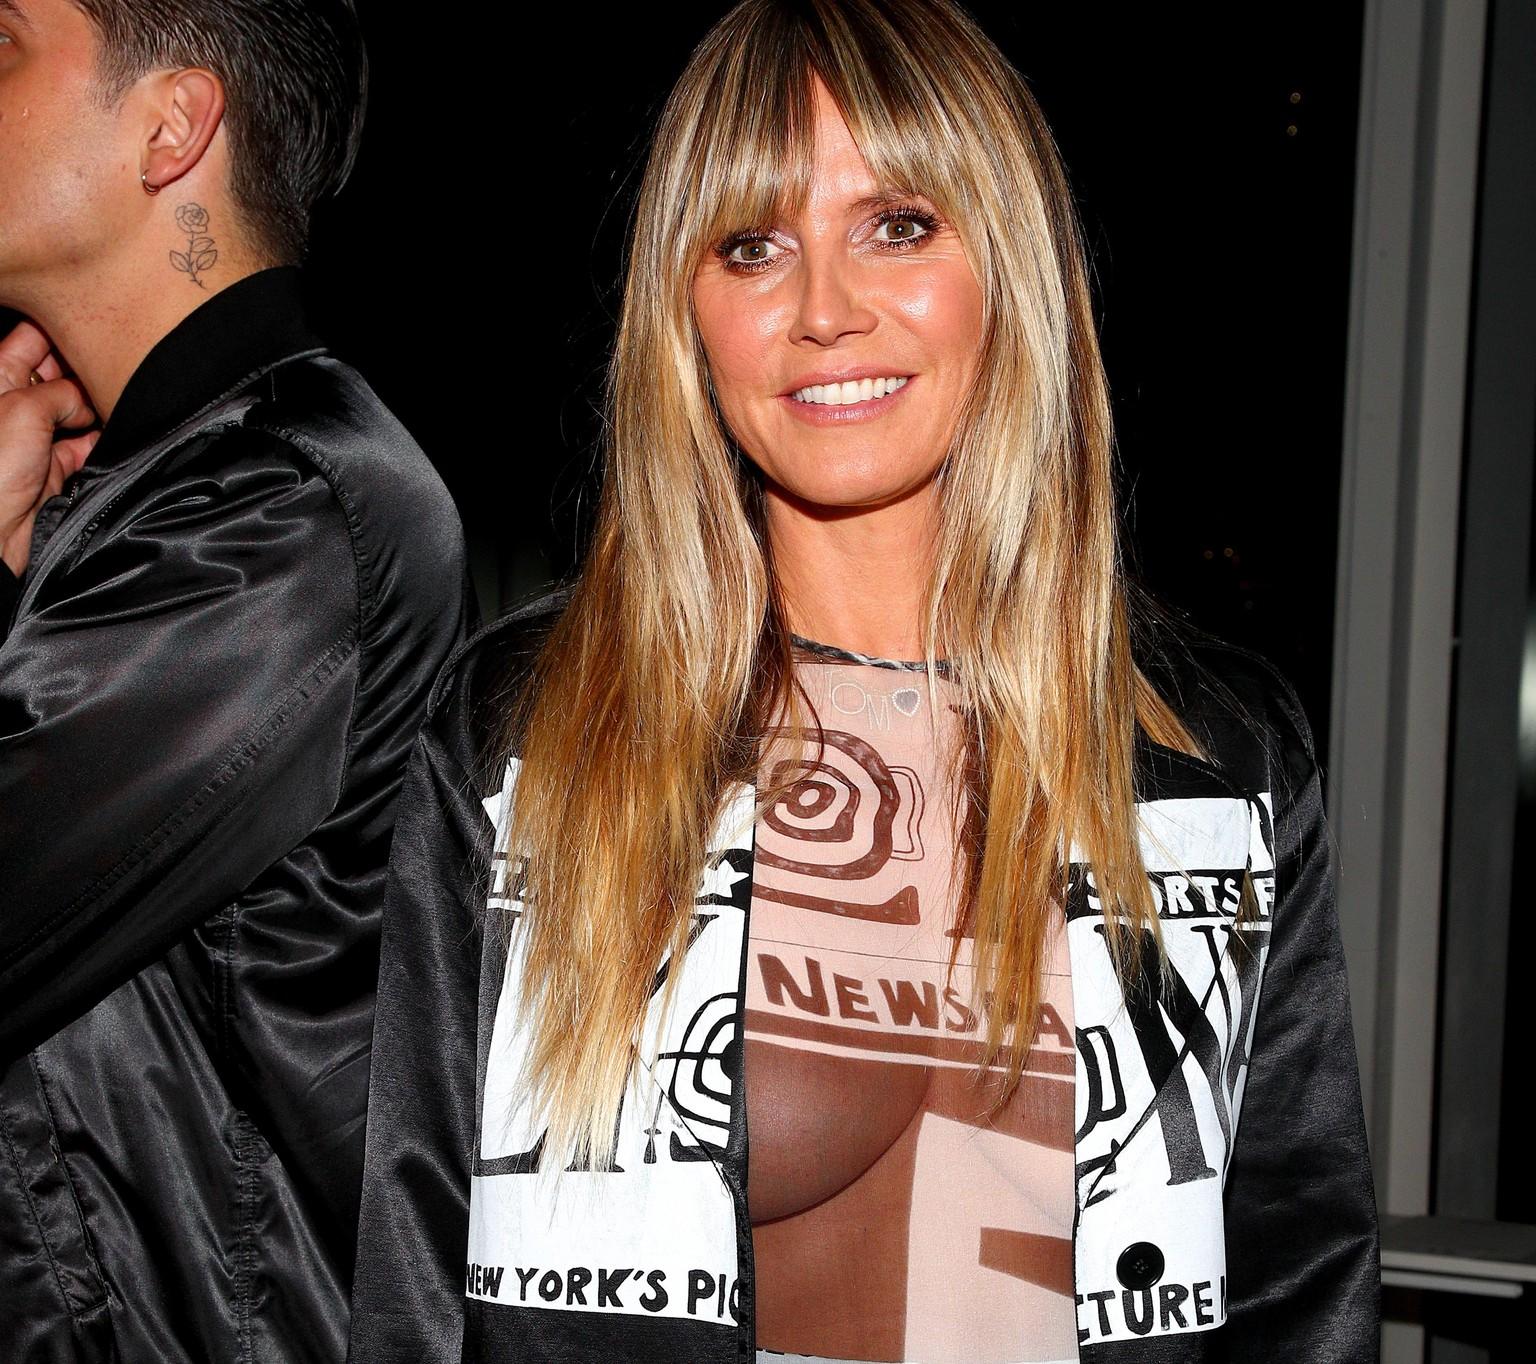 Heidi nackt bill kaulitz und klum Heidi Klum